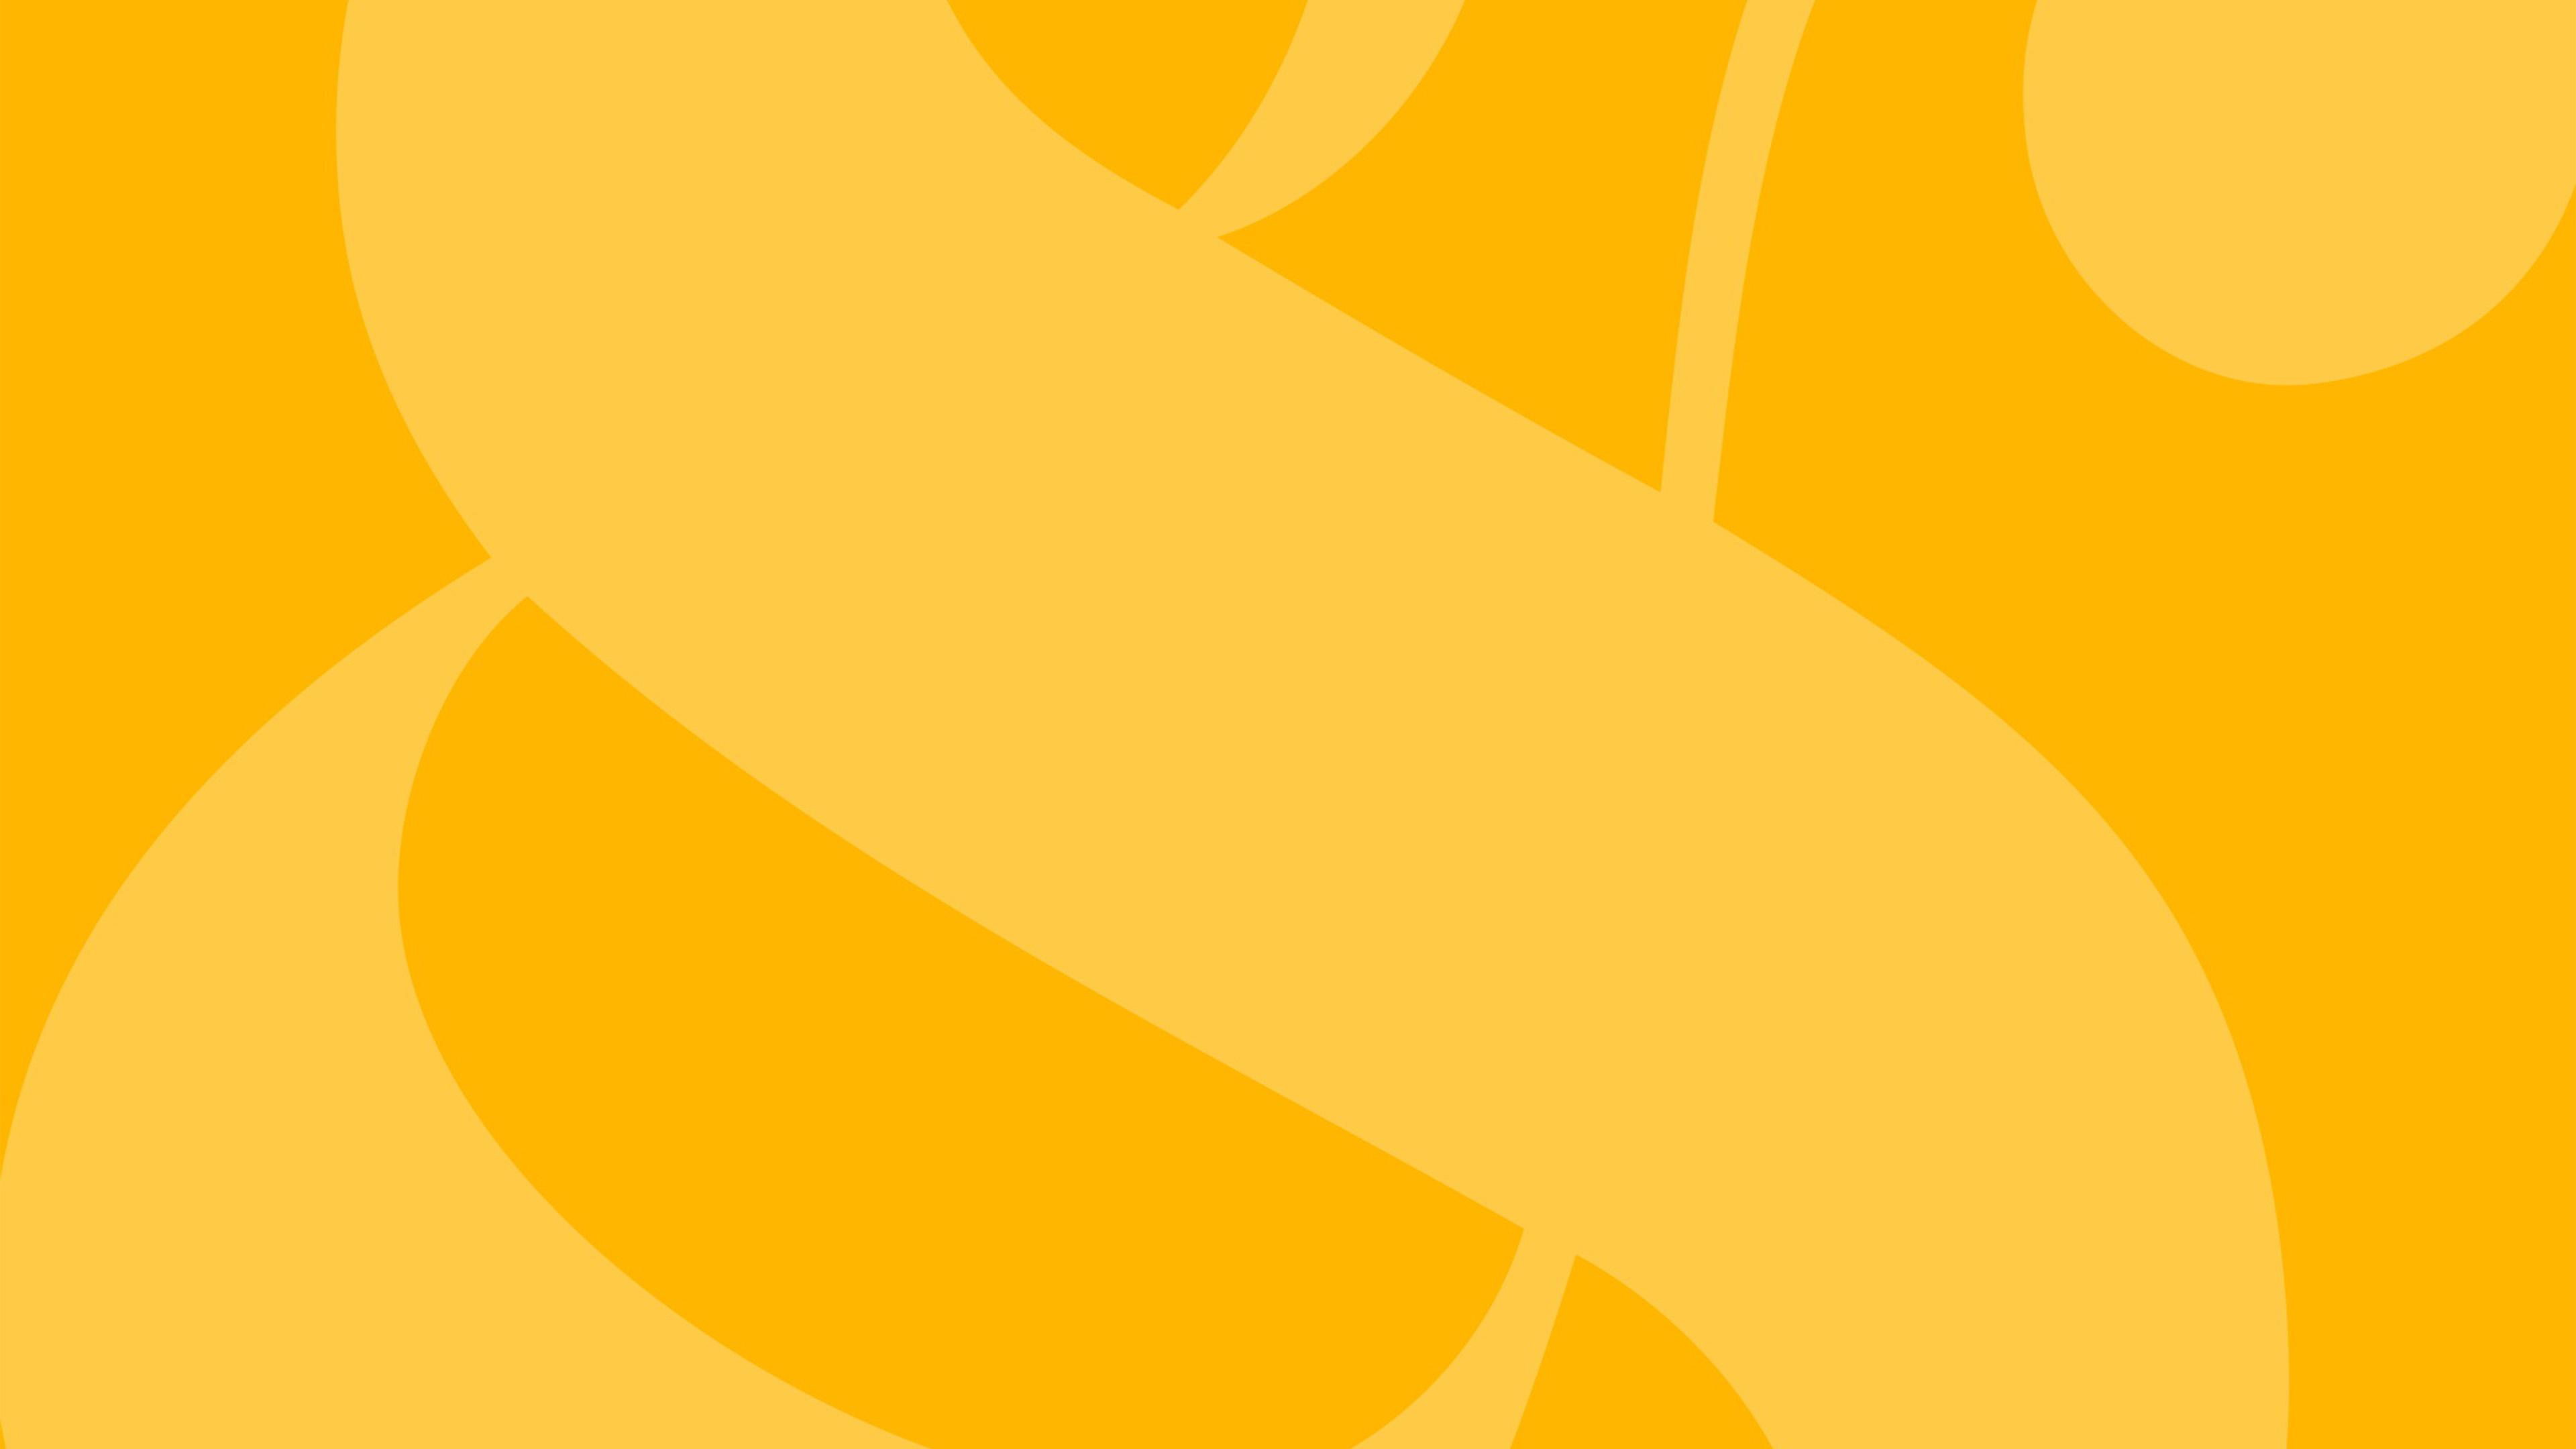 wallpaper for desktop, laptop | ax21-and-yellow-minimal ...